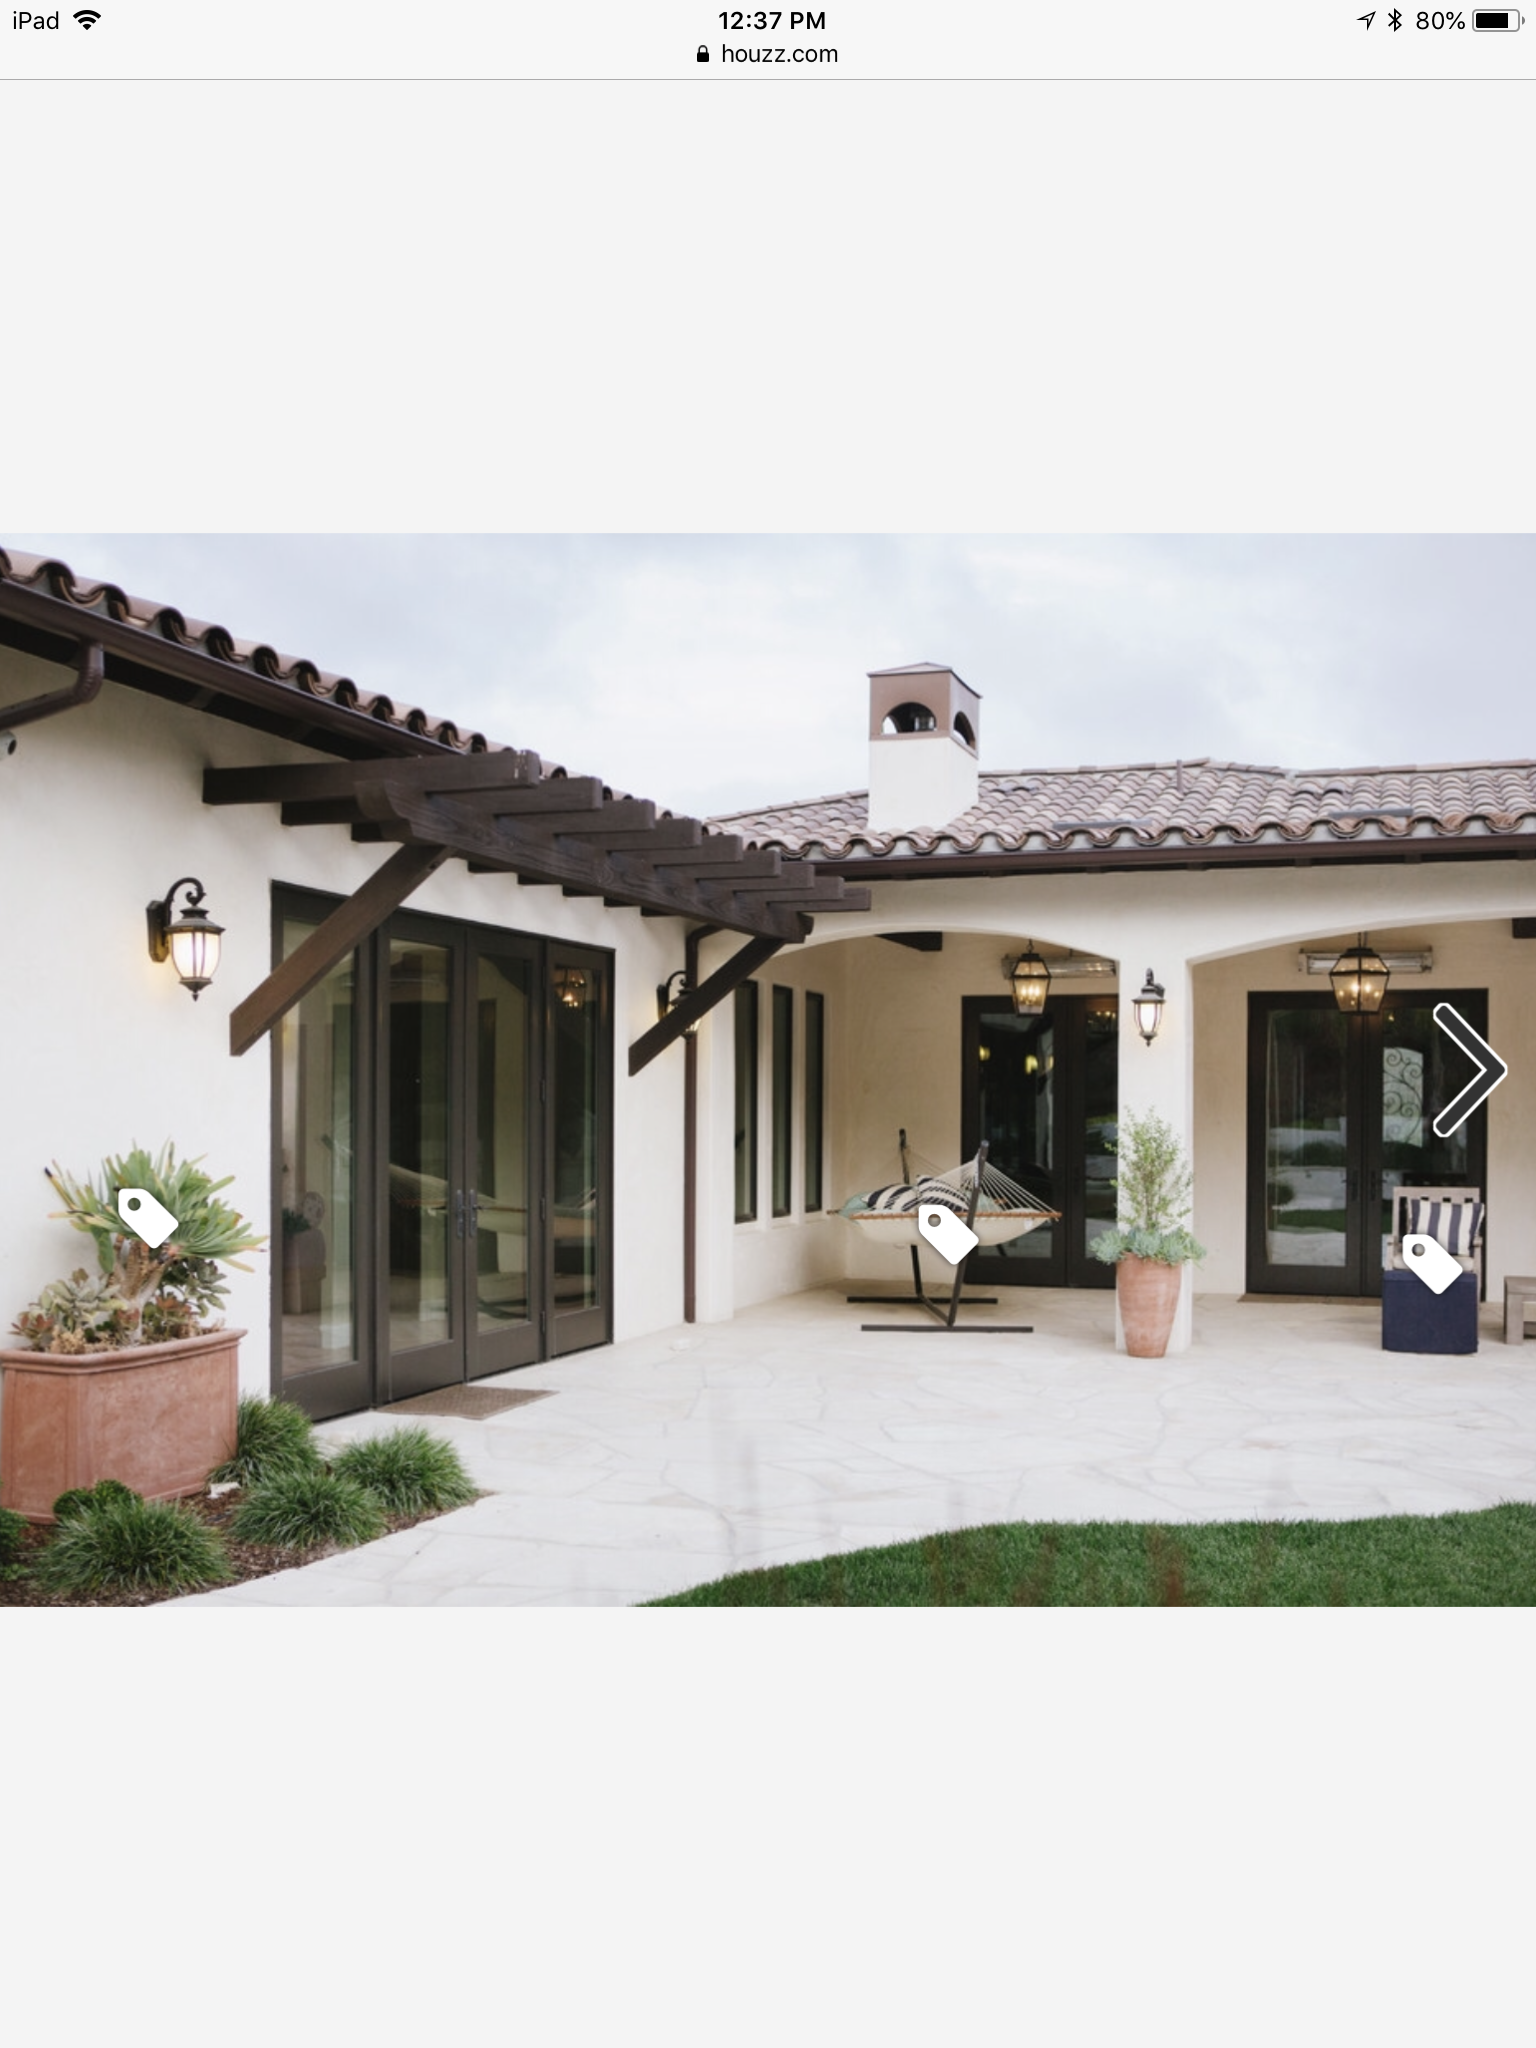 Merlex Stucco In Bisque Stucco Colors Backyard Decor Exterior Paint